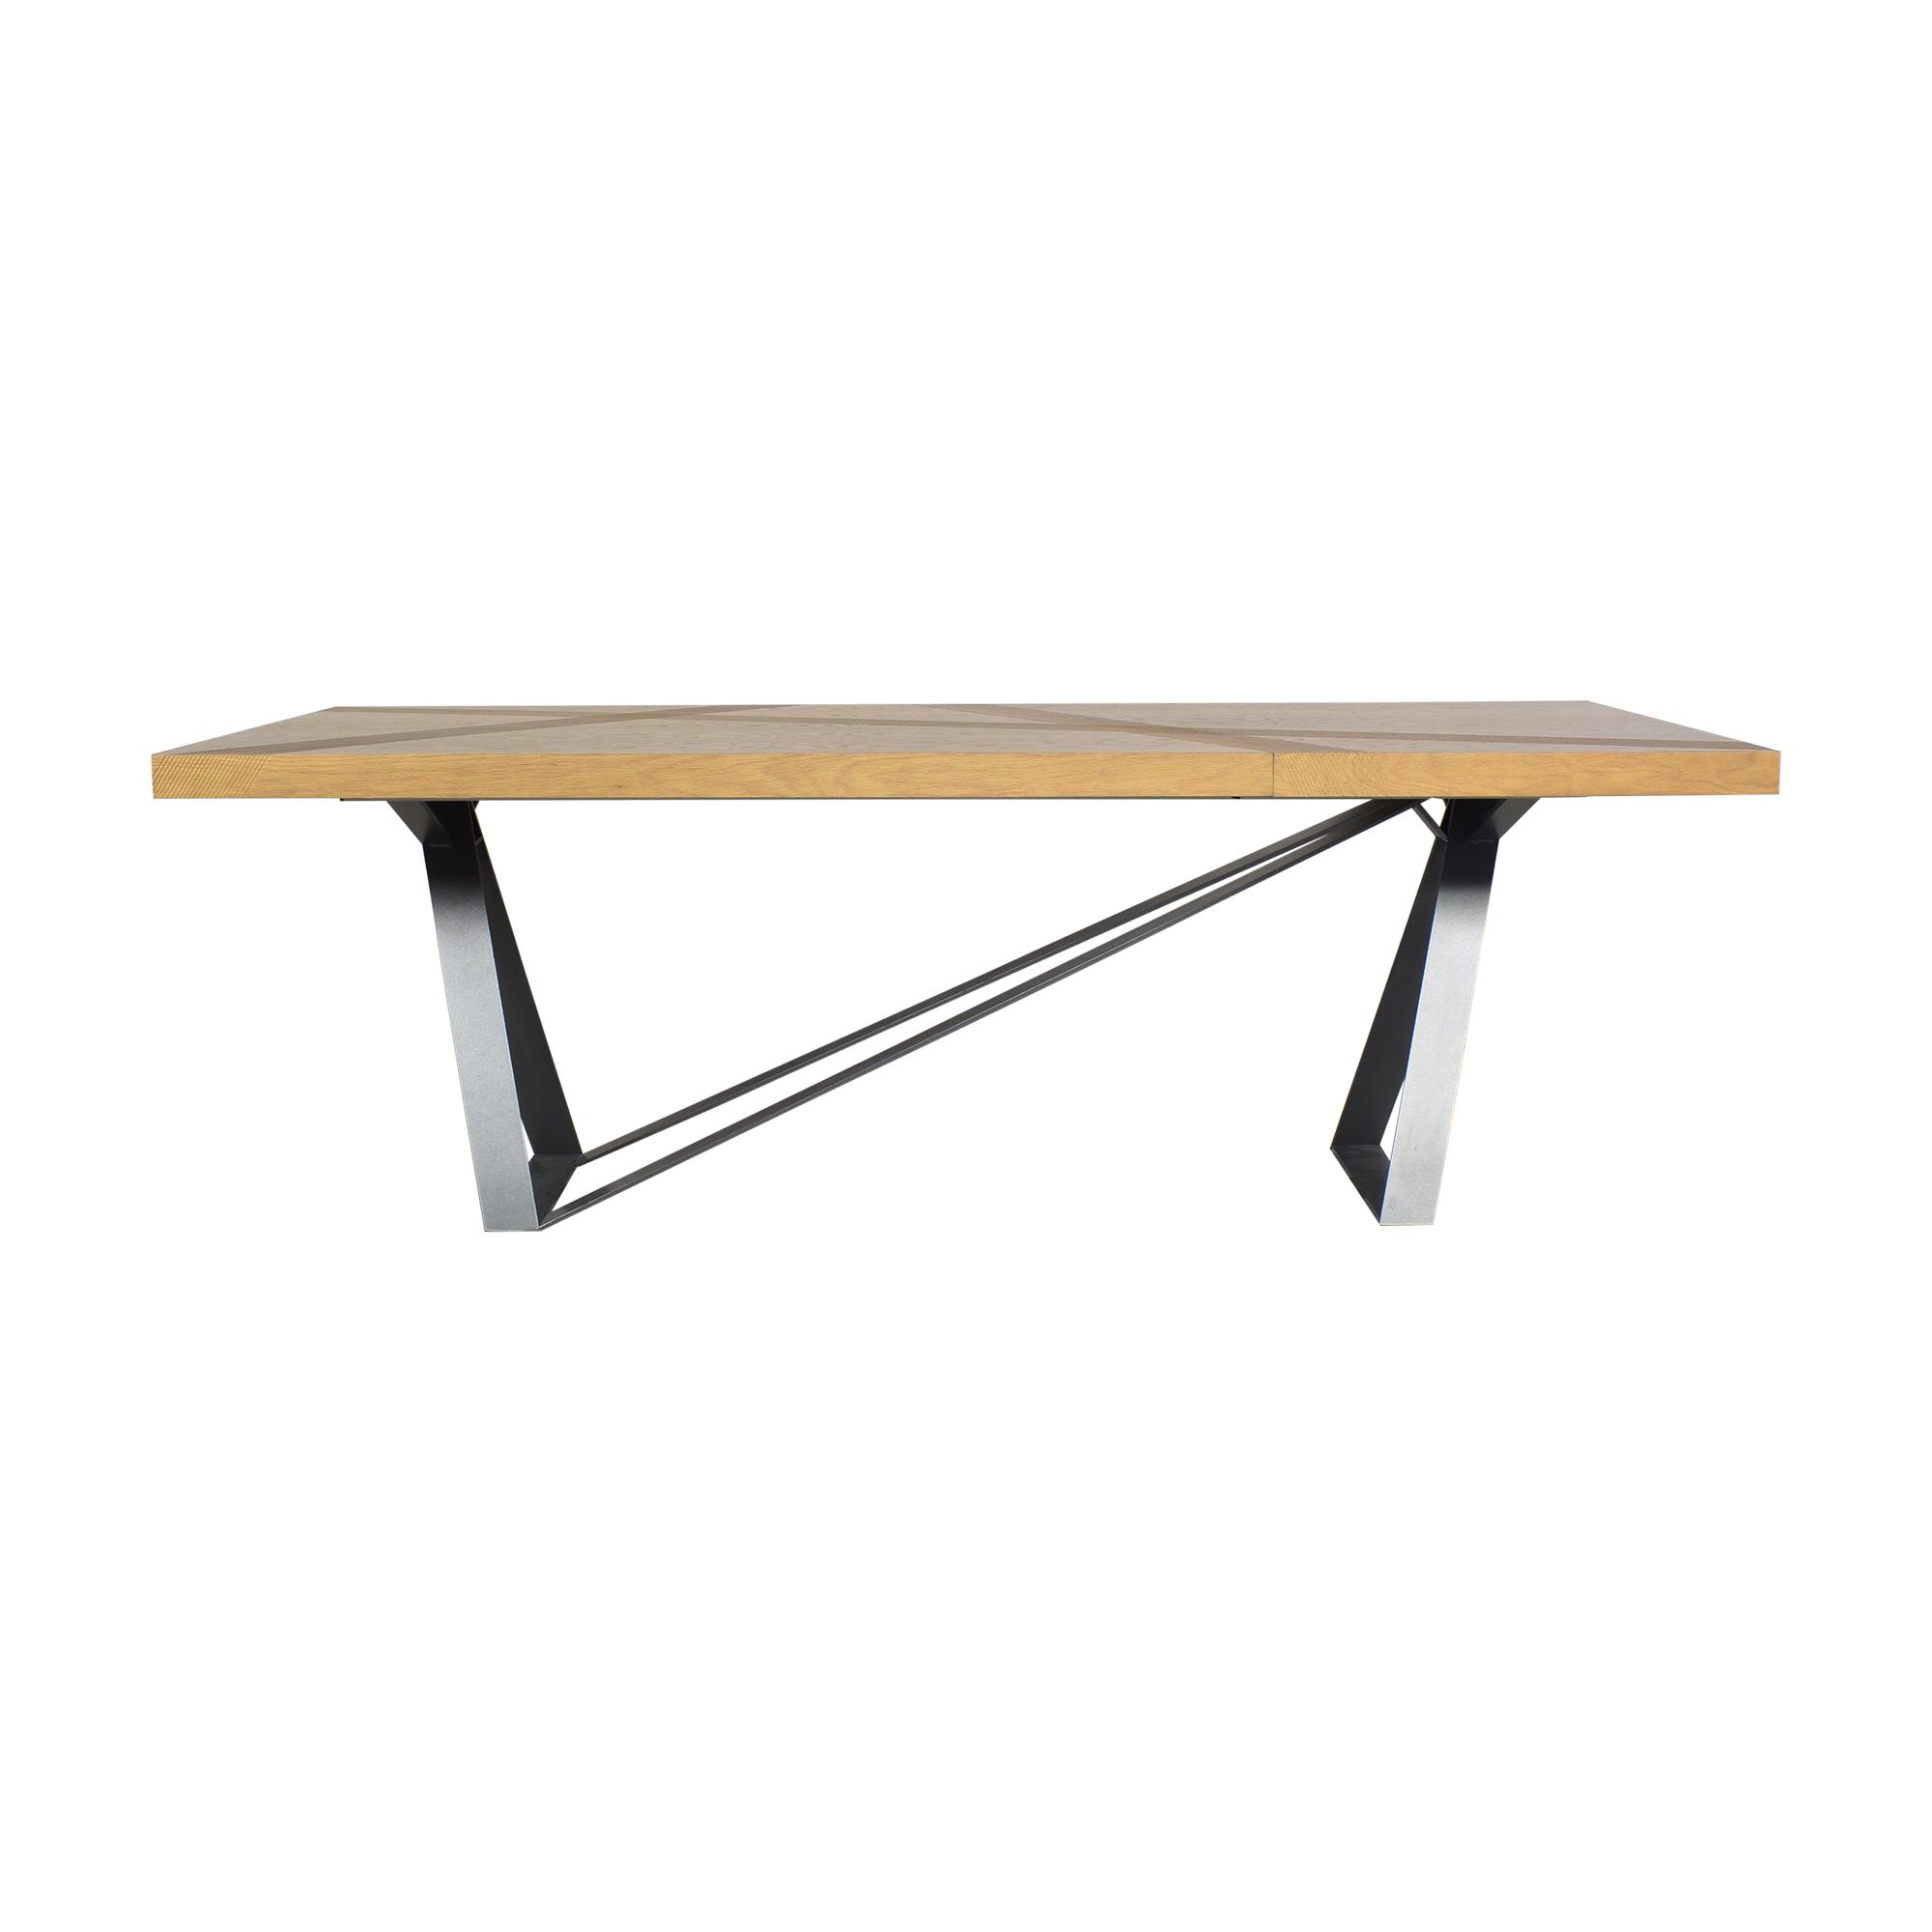 Roche Bobois Roche Bobois Track Extendable Dining Table nj